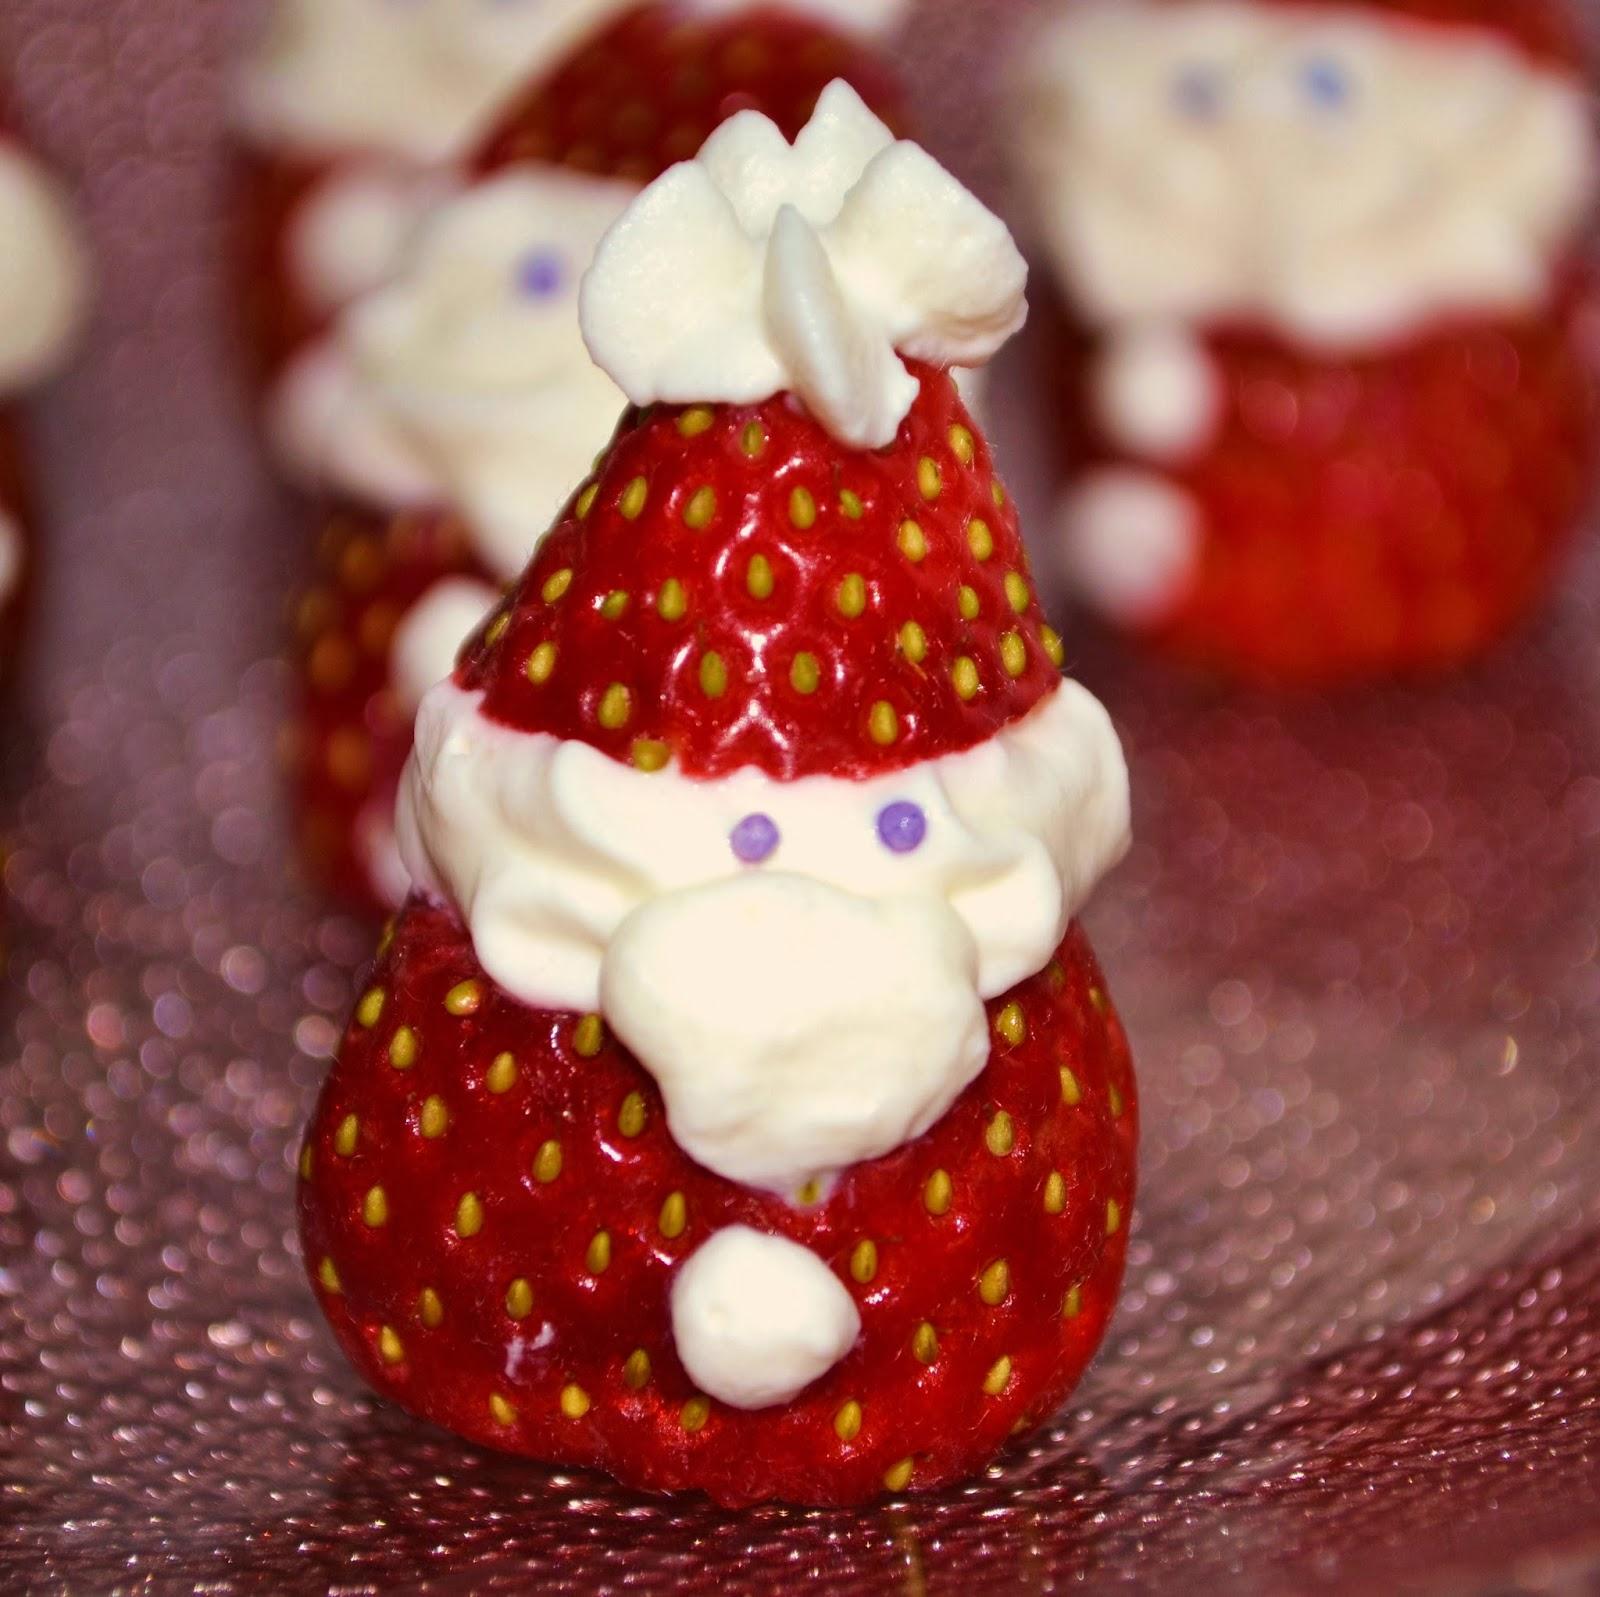 Priv de dessert fraises de no l - Dessert de noel leger ...